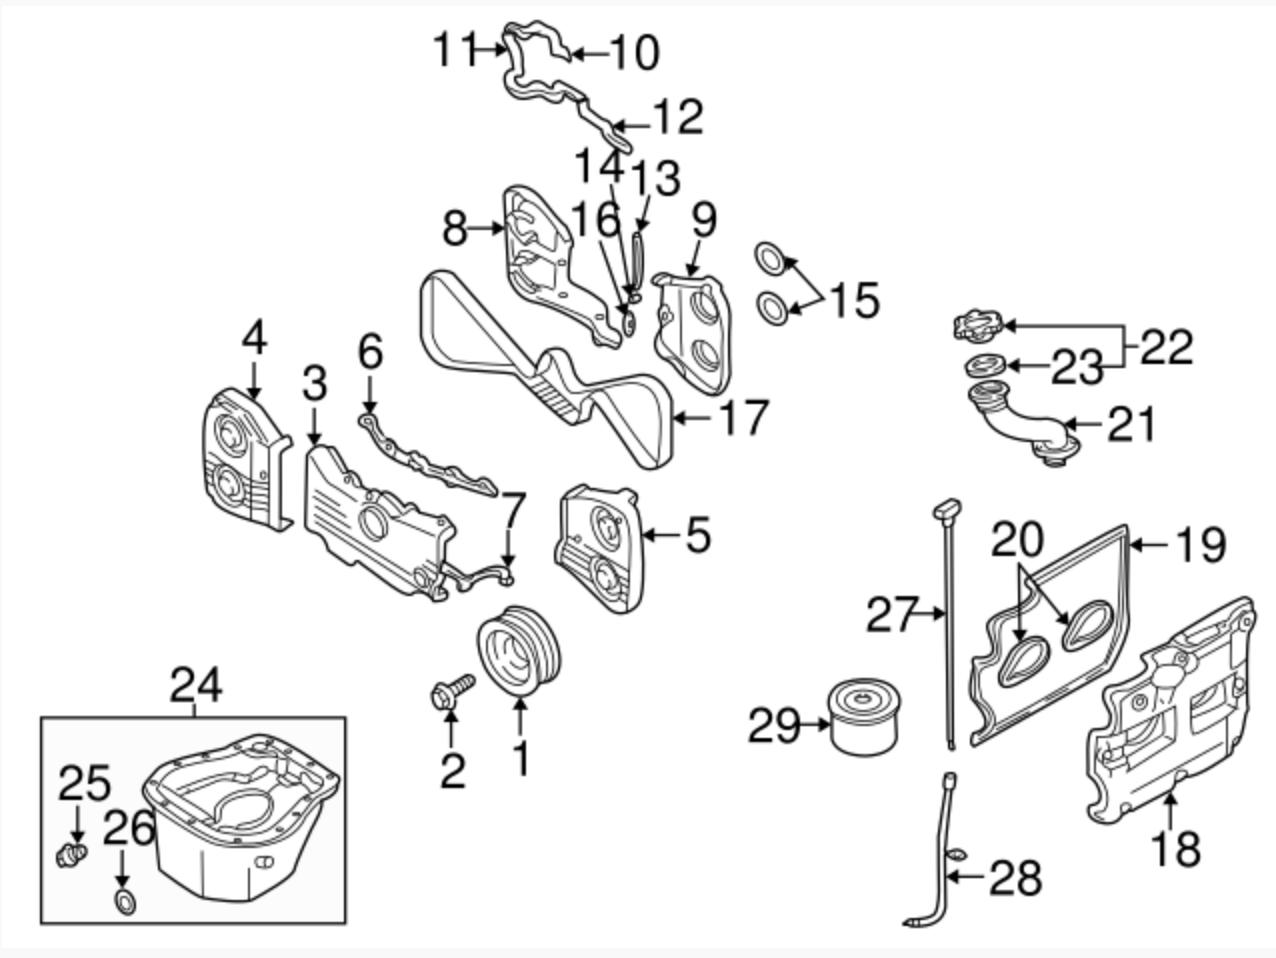 hight resolution of subaru forester valve diagram wiring diagram used engine 2012 subaru forester